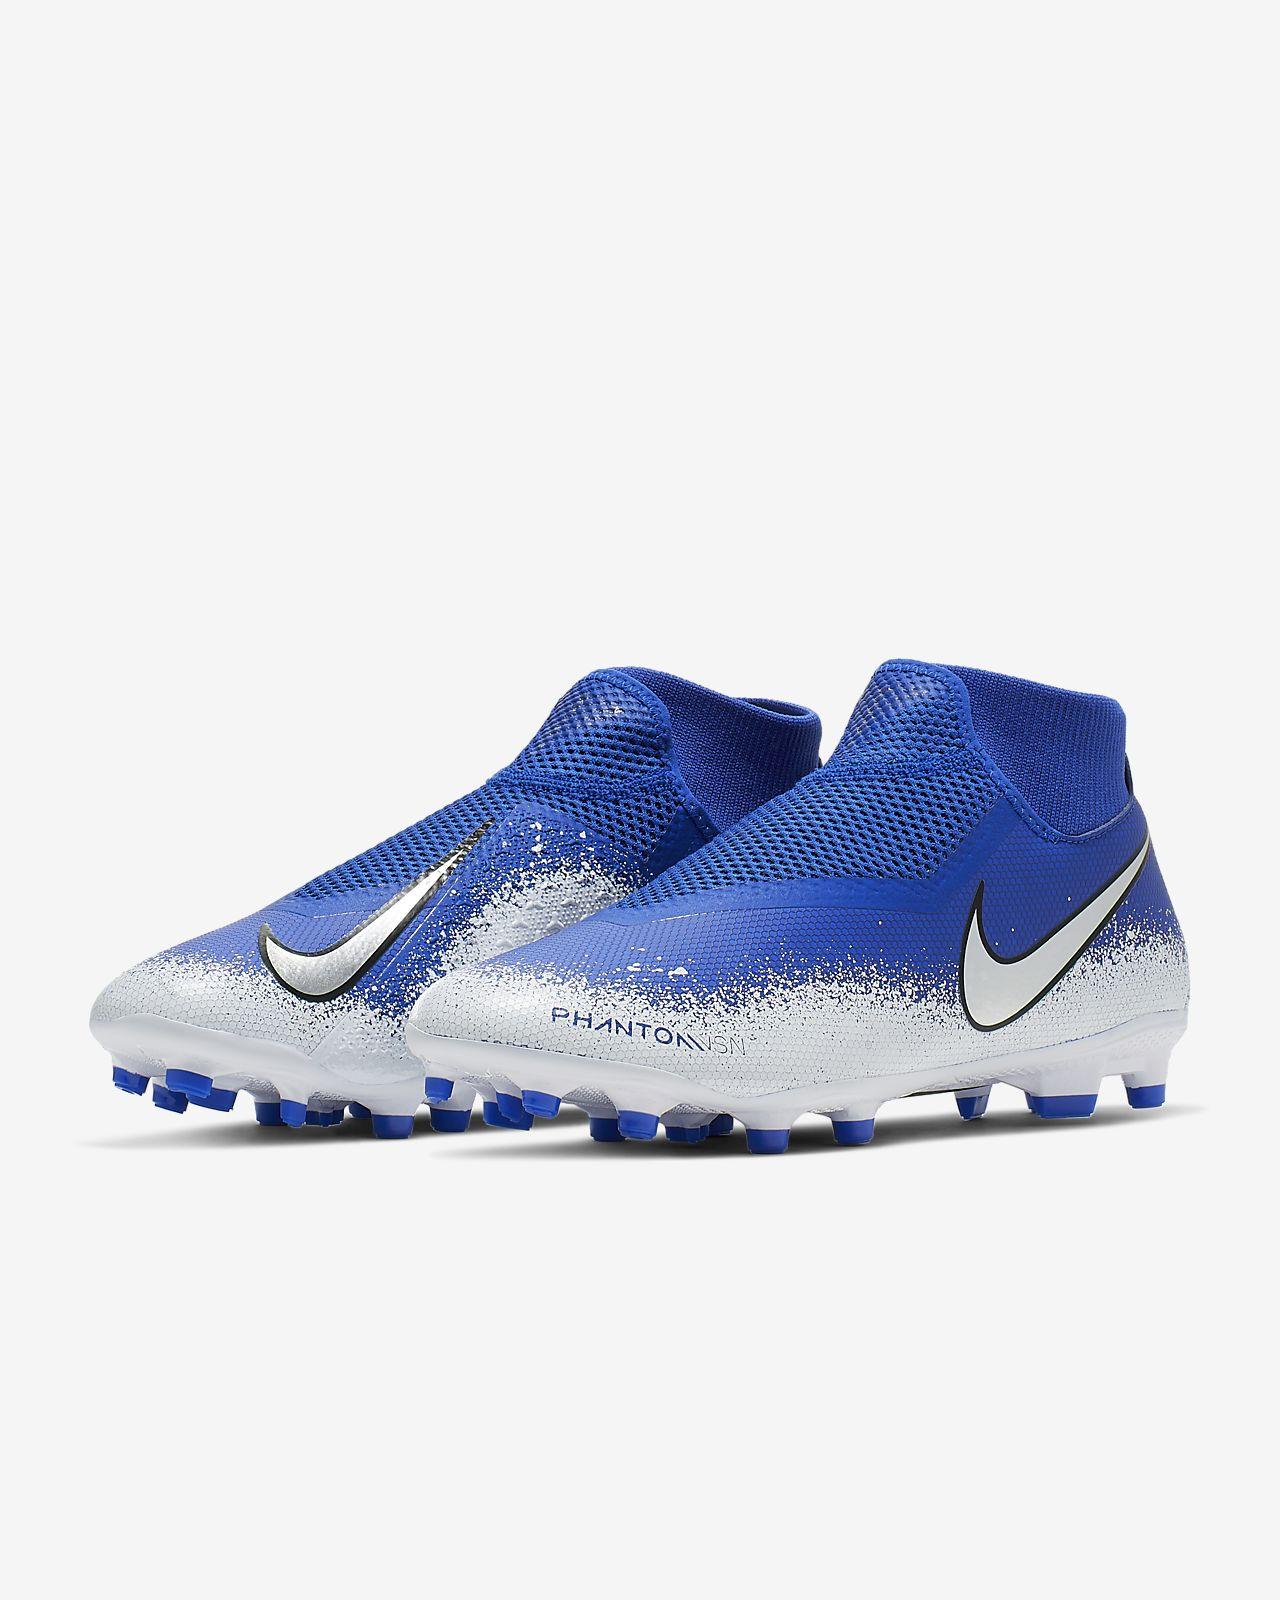 abc05488 ... Nike Phantom Vision Academy Dynamic Fit MG Multi-Ground Football Boot